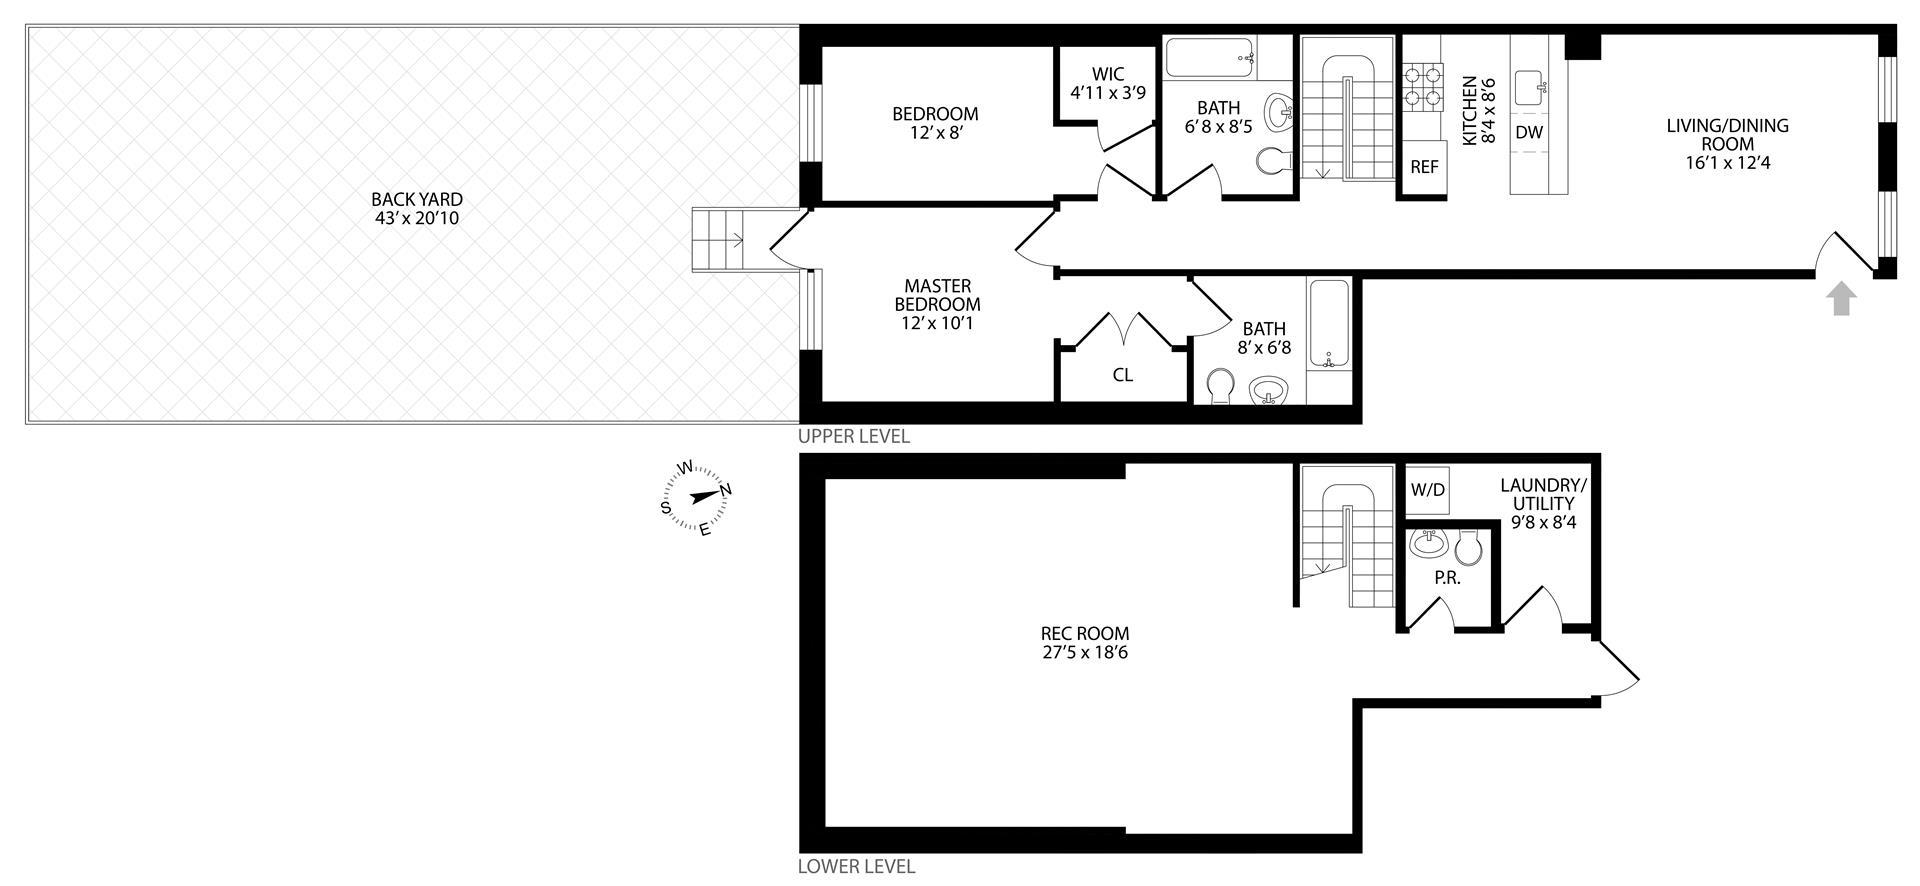 Floor plan of 96 4th Pl, 1 - Carroll Gardens, New York